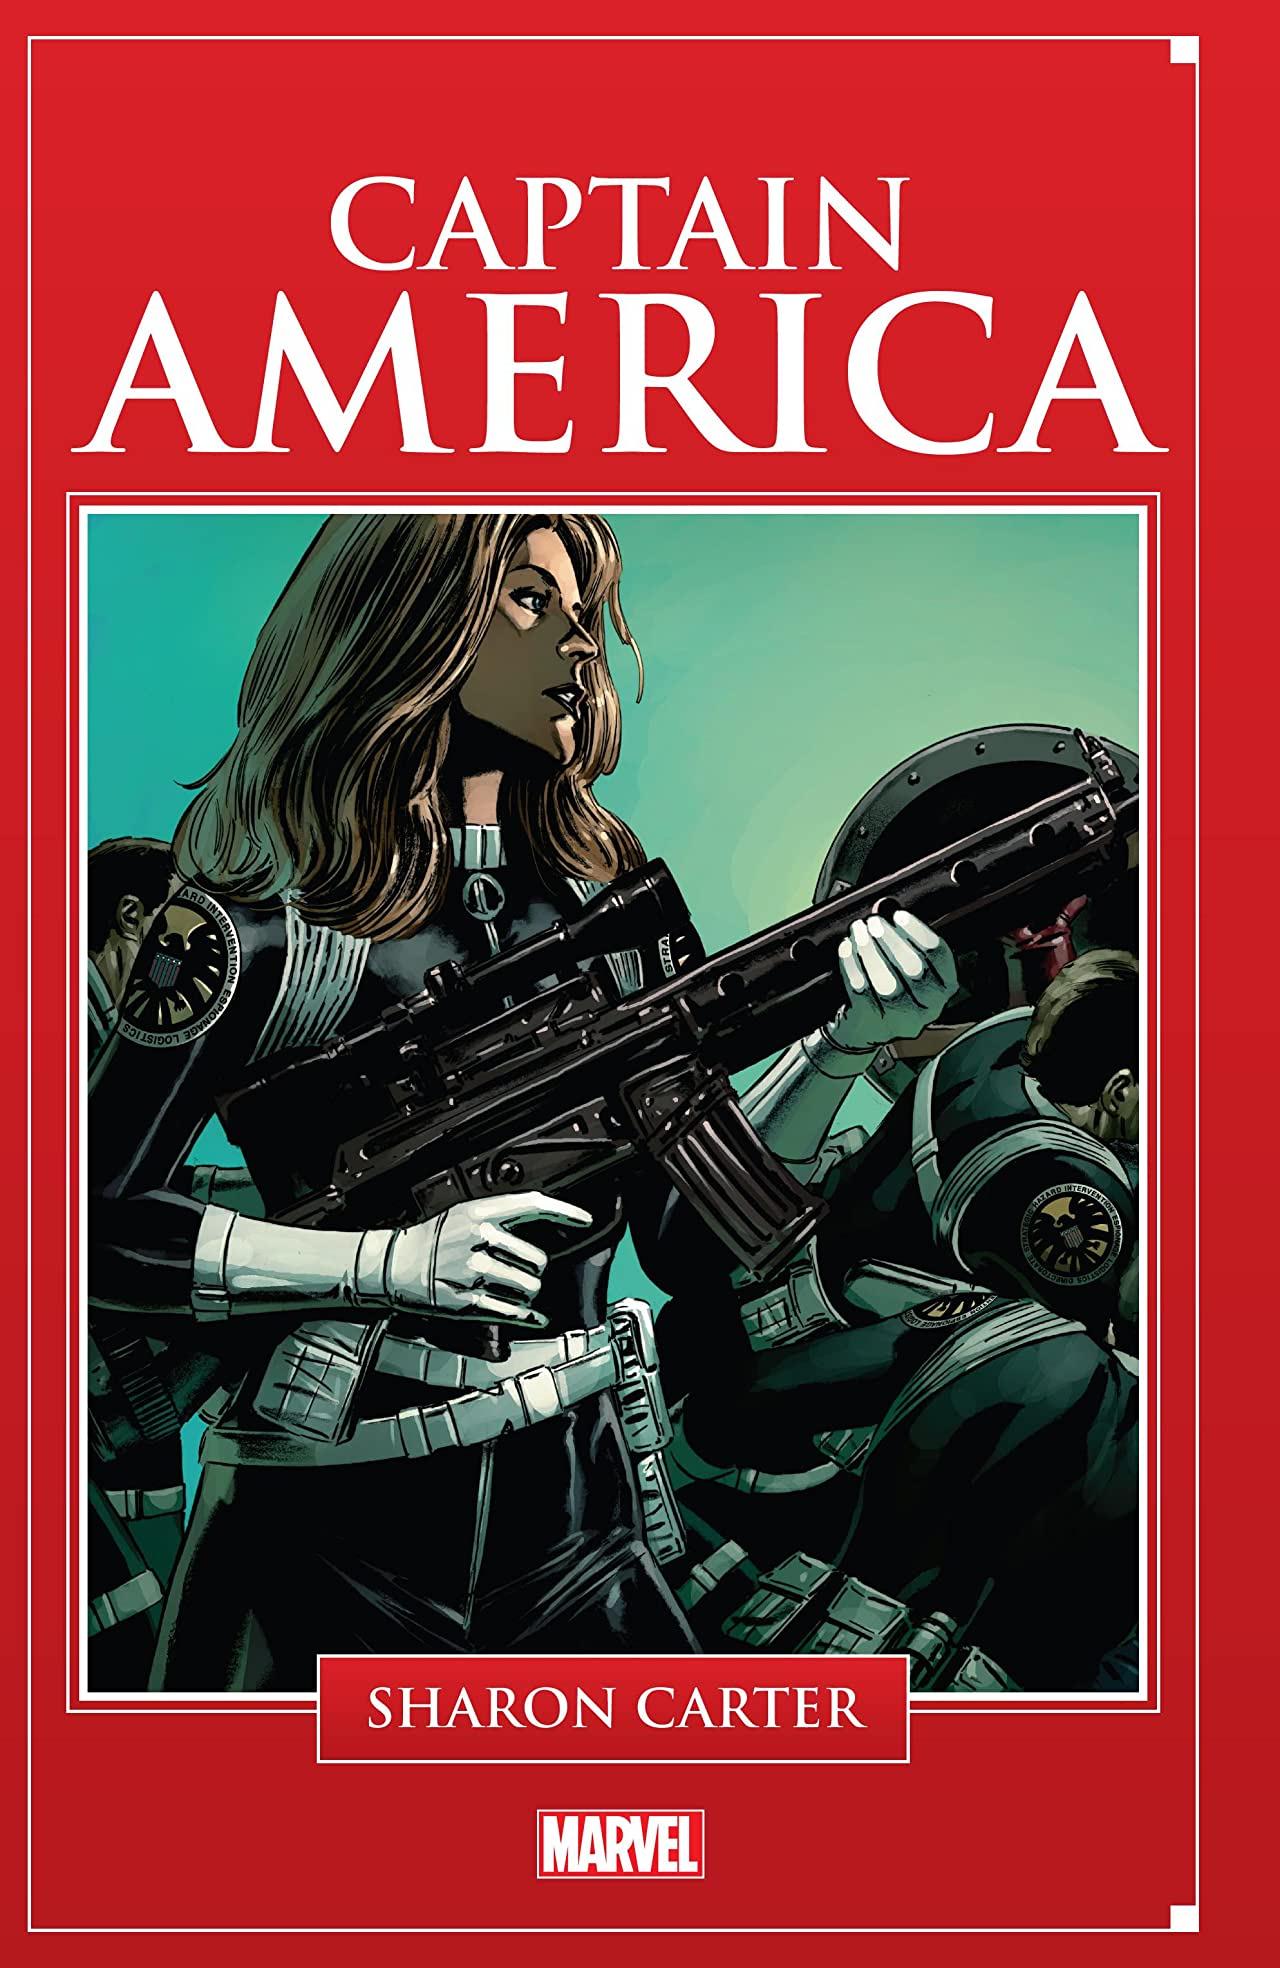 Captain America: Sharon Carter (Trade Paperback)